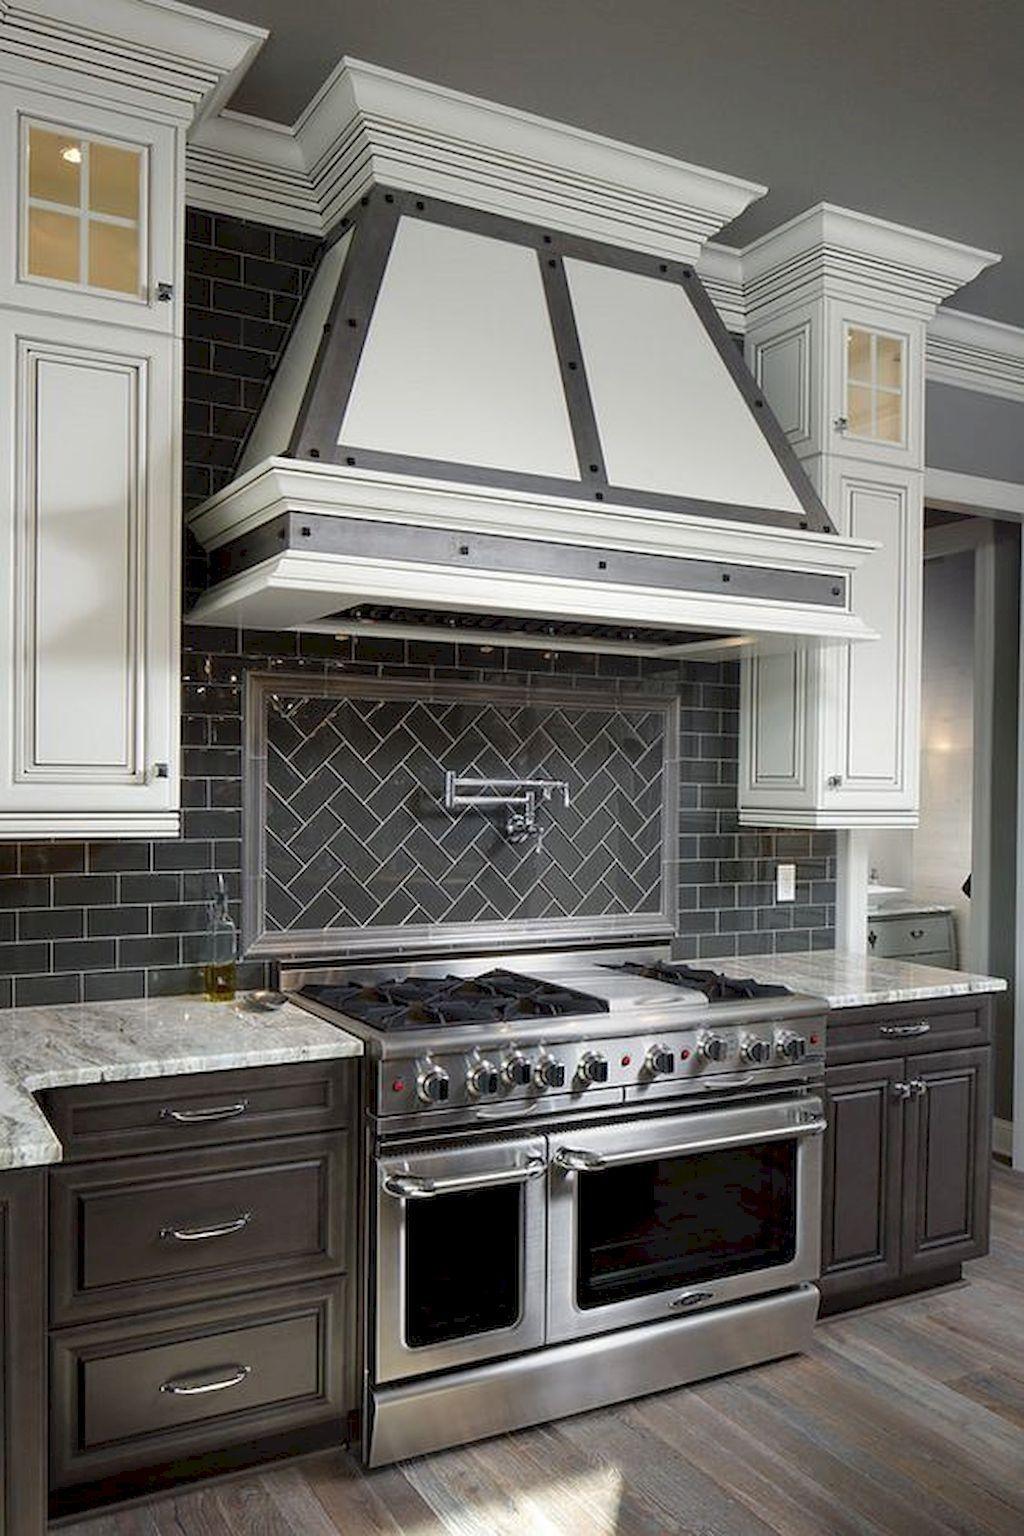 Affordable Kitchen Backsplash Decor Ideas 47